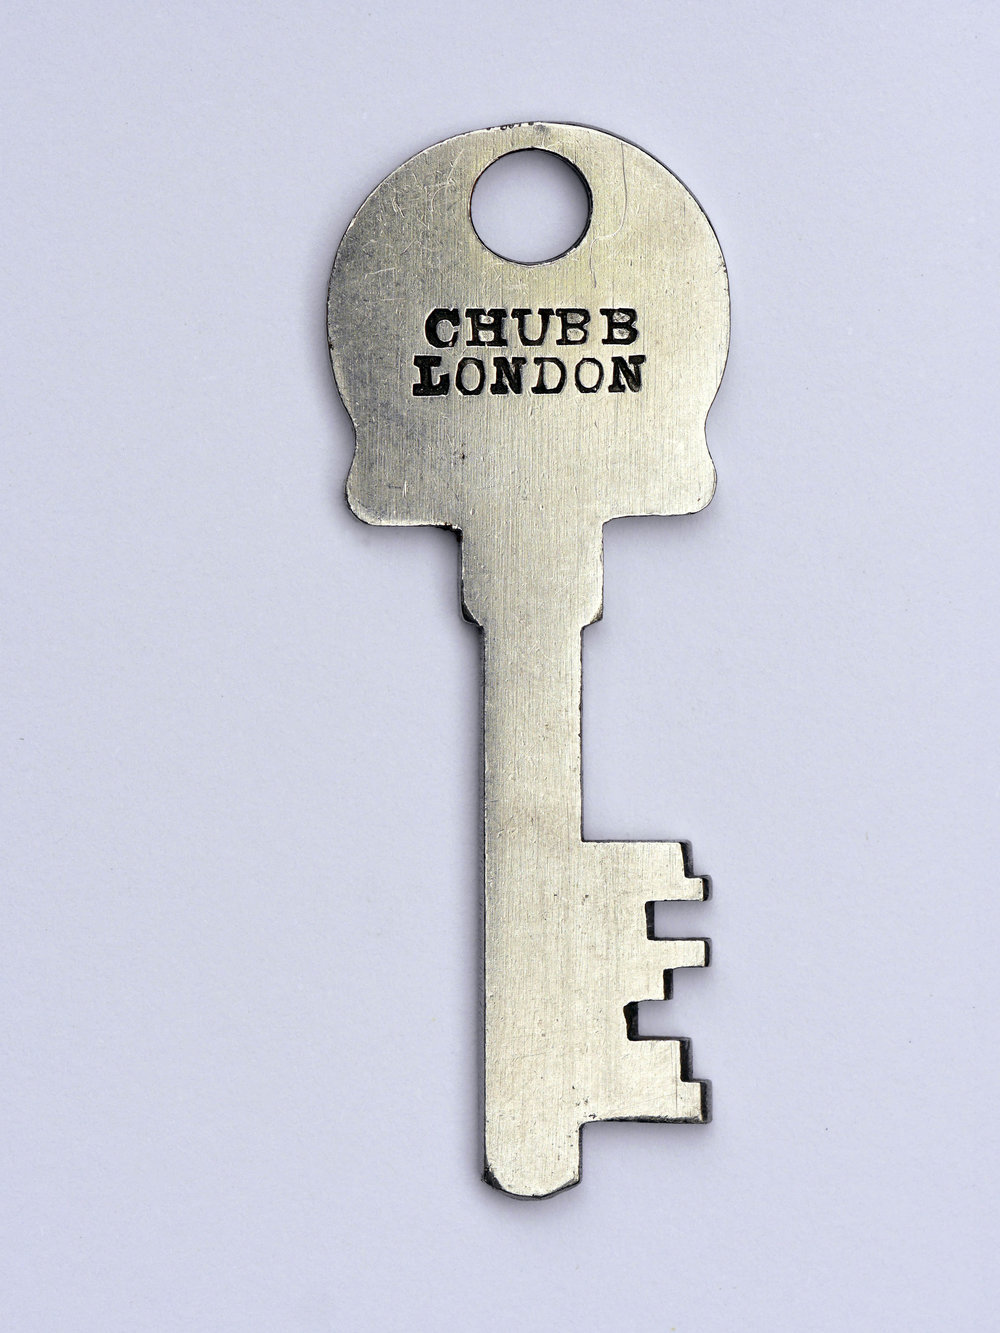 2 The key.jpg